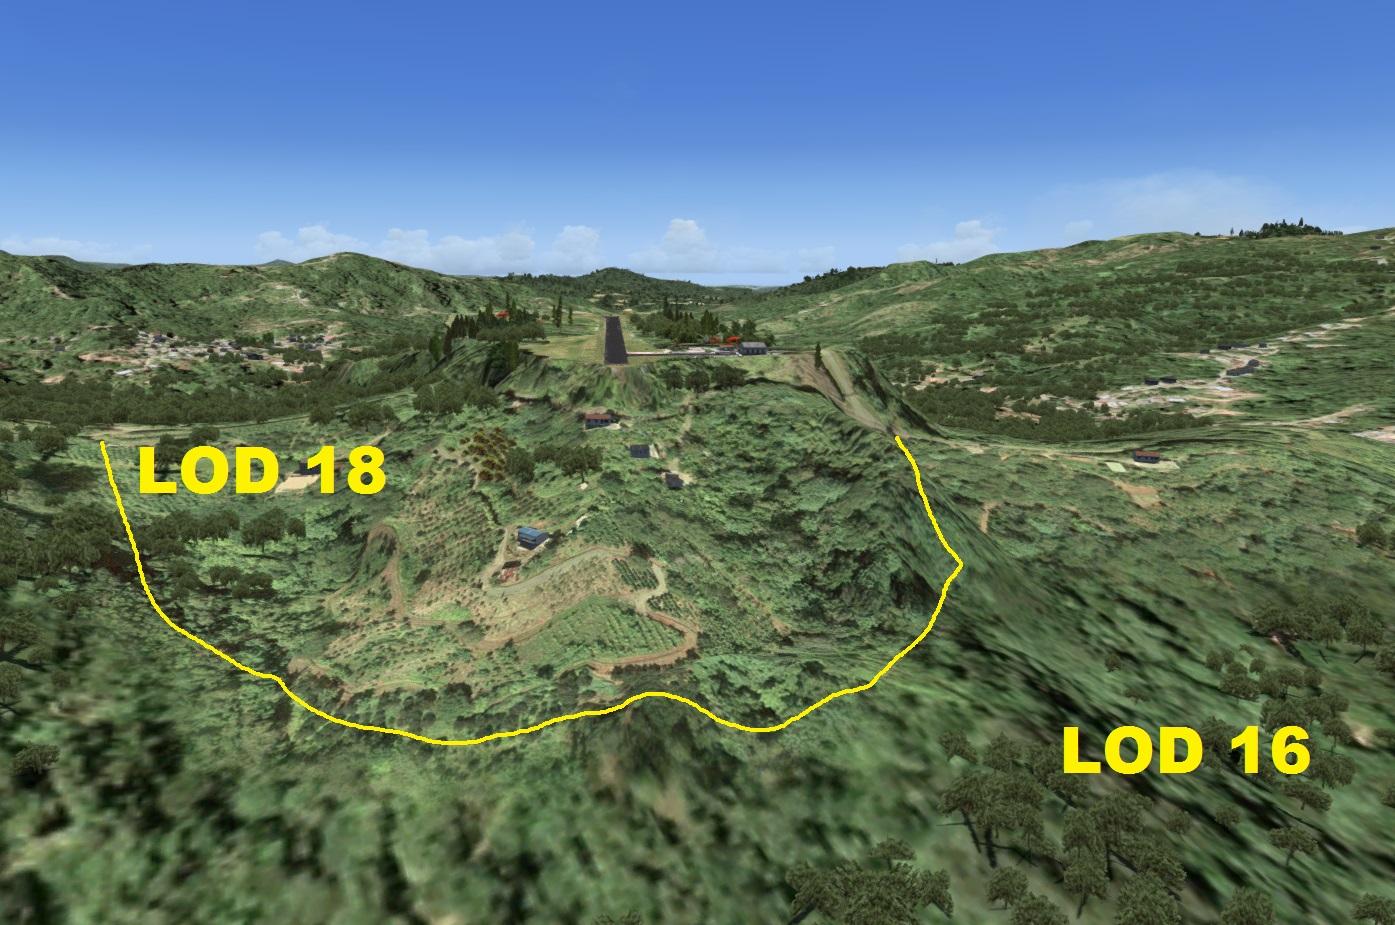 LOD_Boundary2.jpg